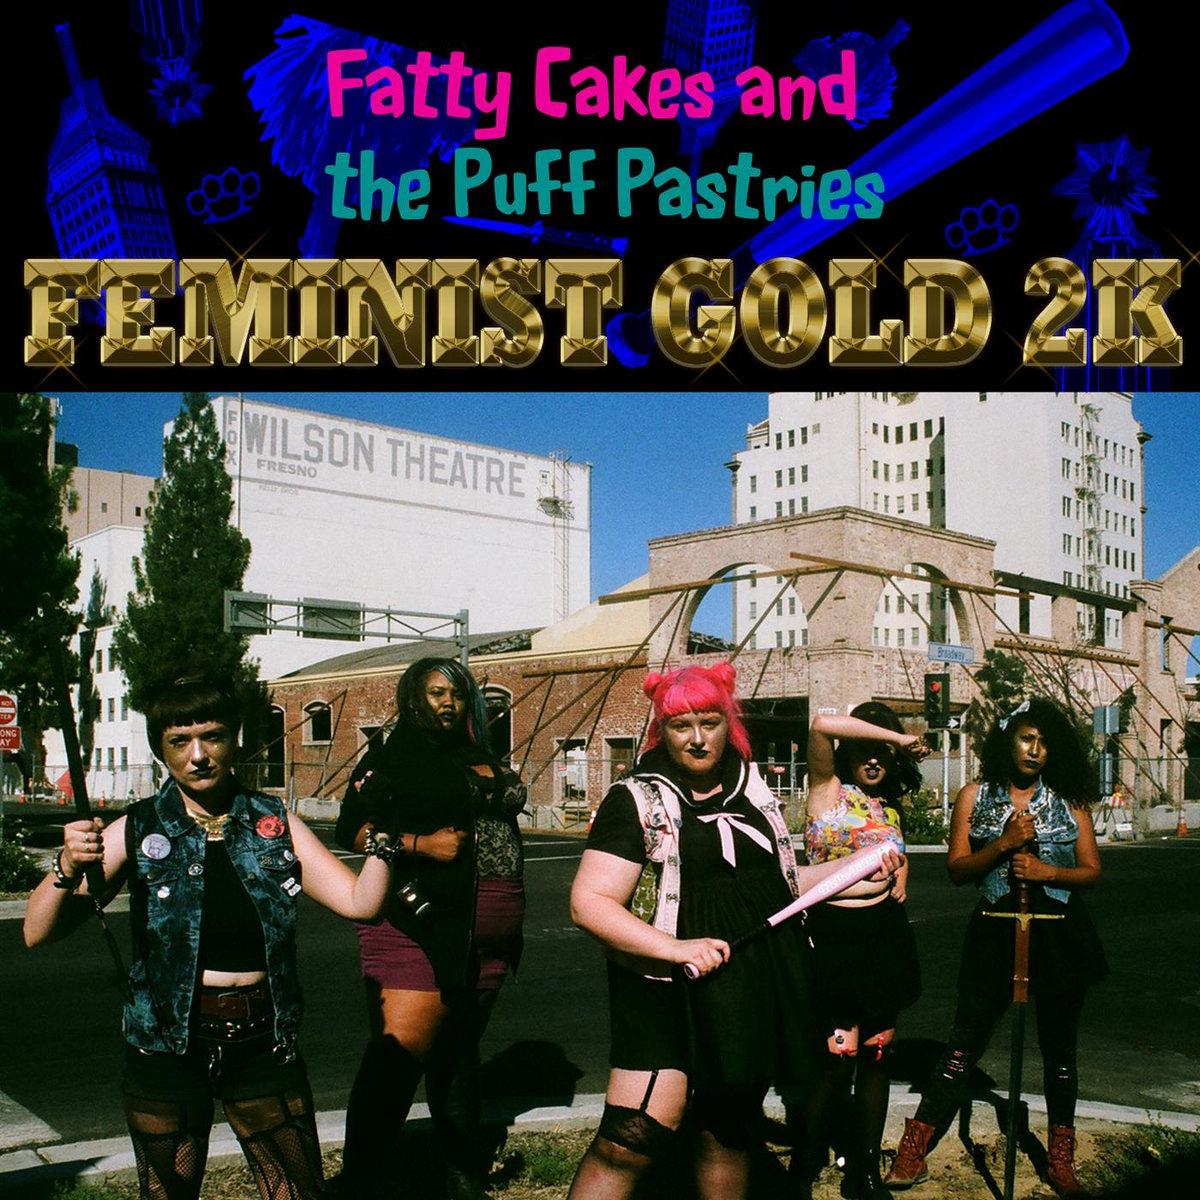 Fatty Cakes Band